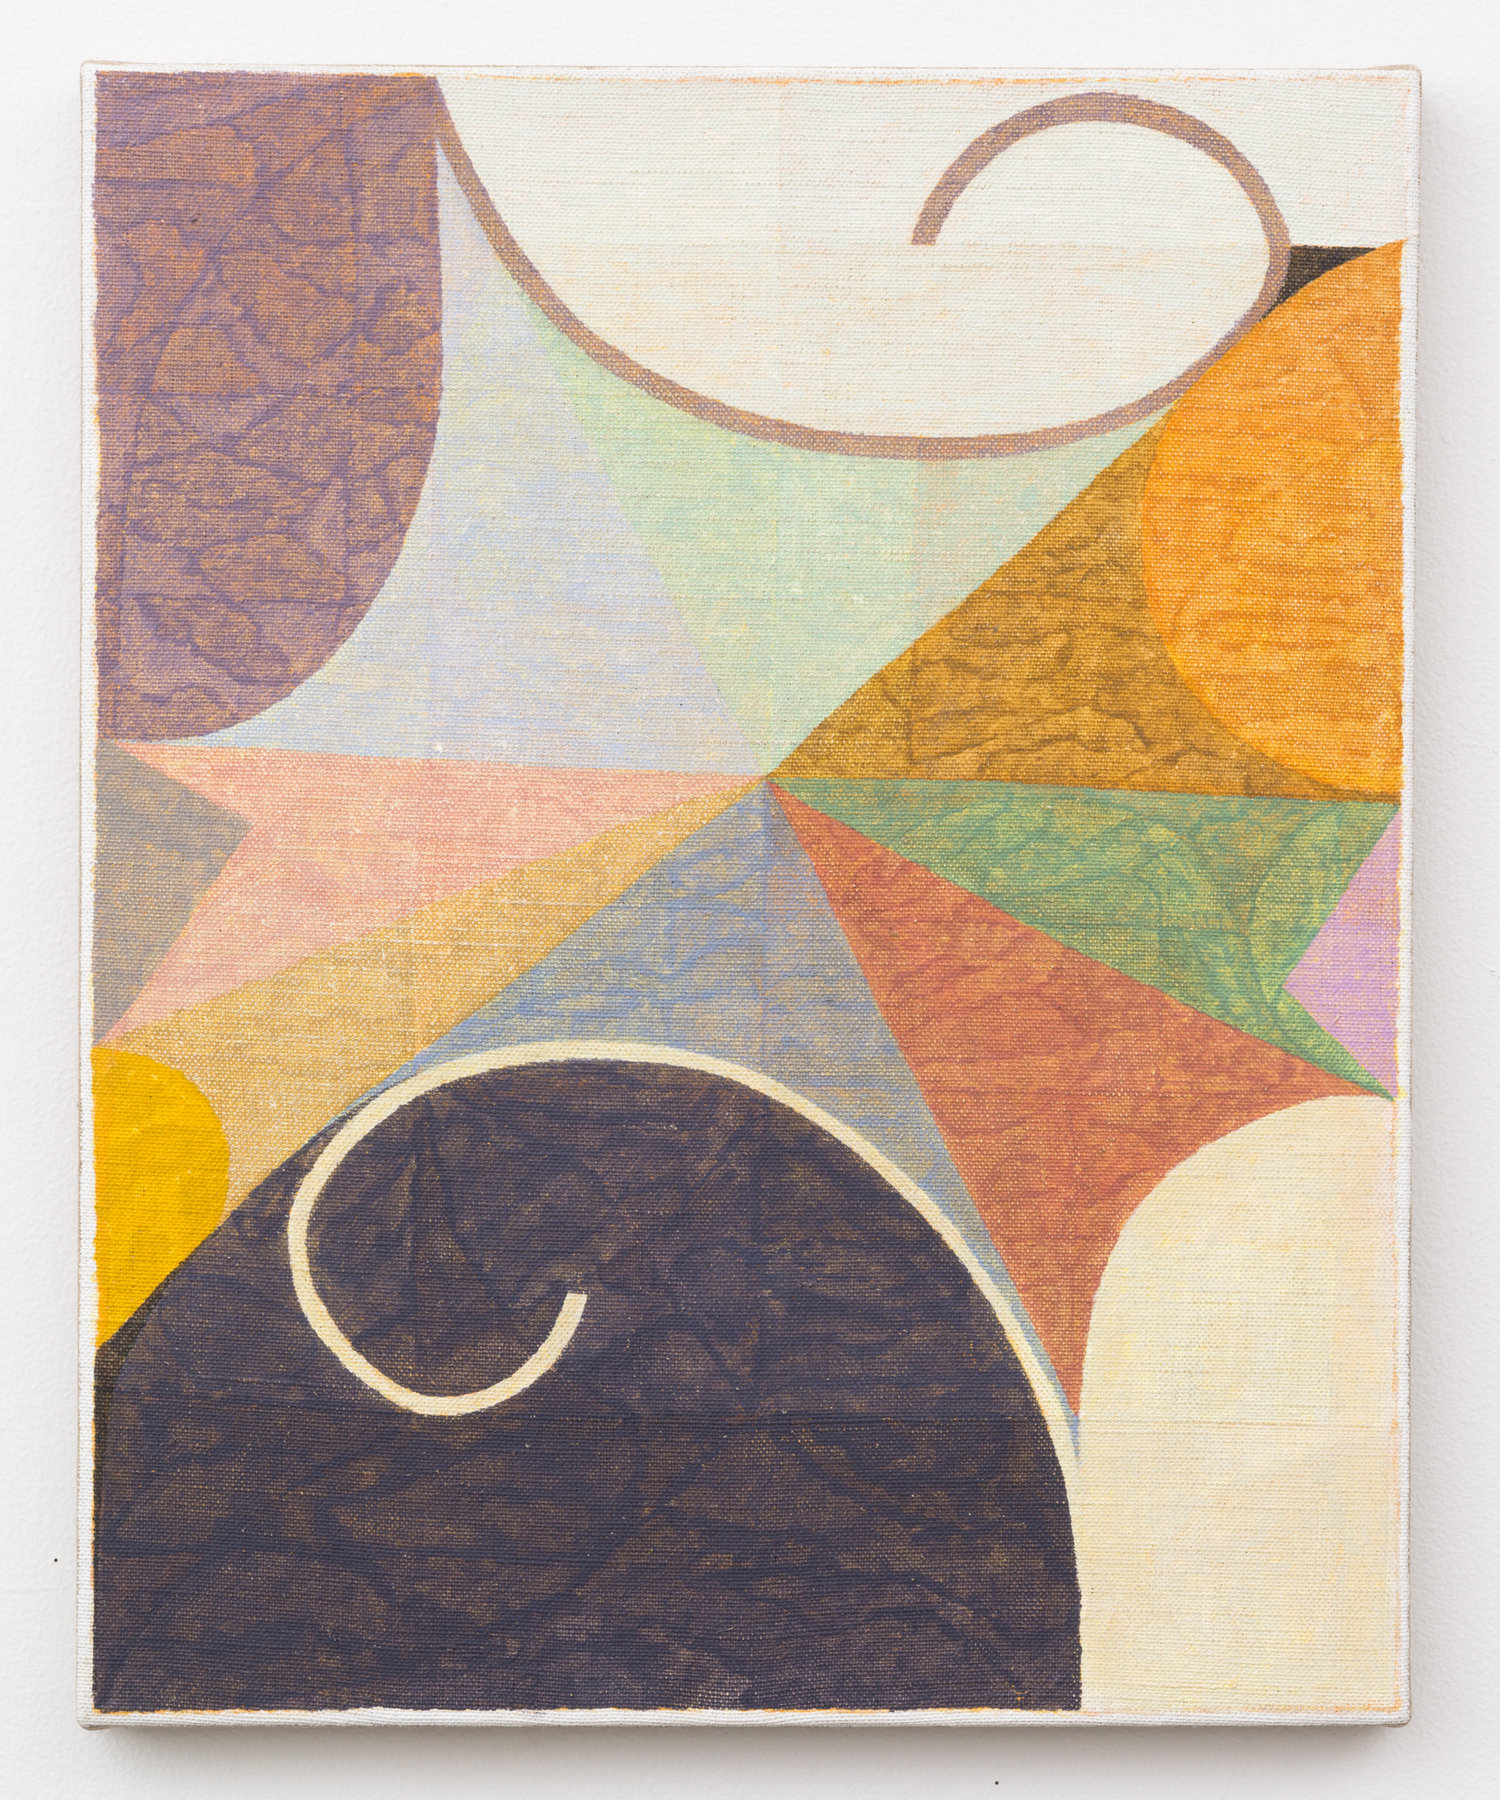 Matt+Phillips+Painting+Bluff.jpg